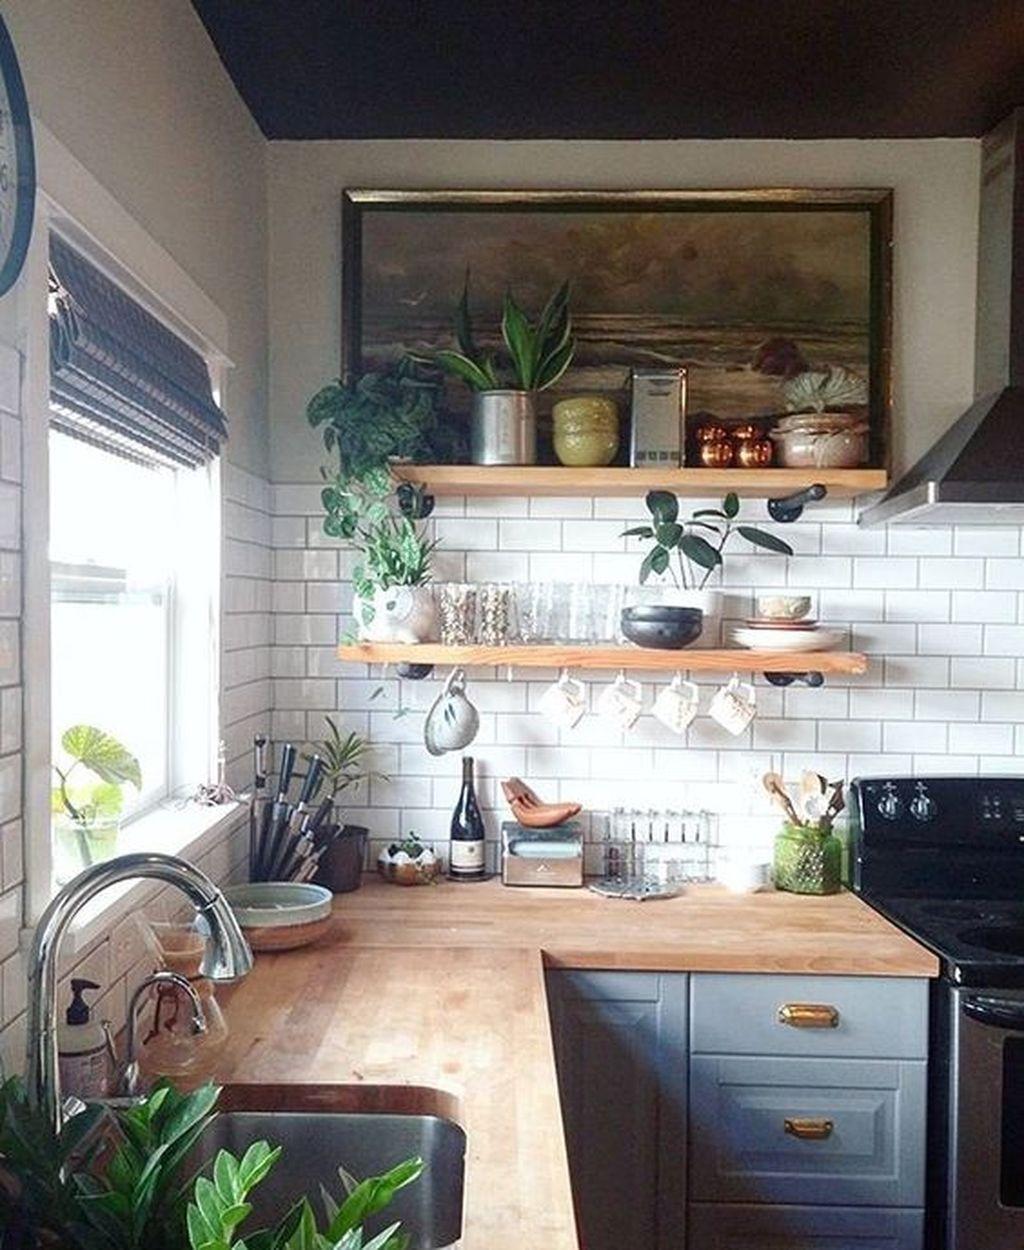 40 popular modern farmhouse kitchen backsplash ideas on best farmhouse kitchen decor ideas and remodel create your dreams id=47921